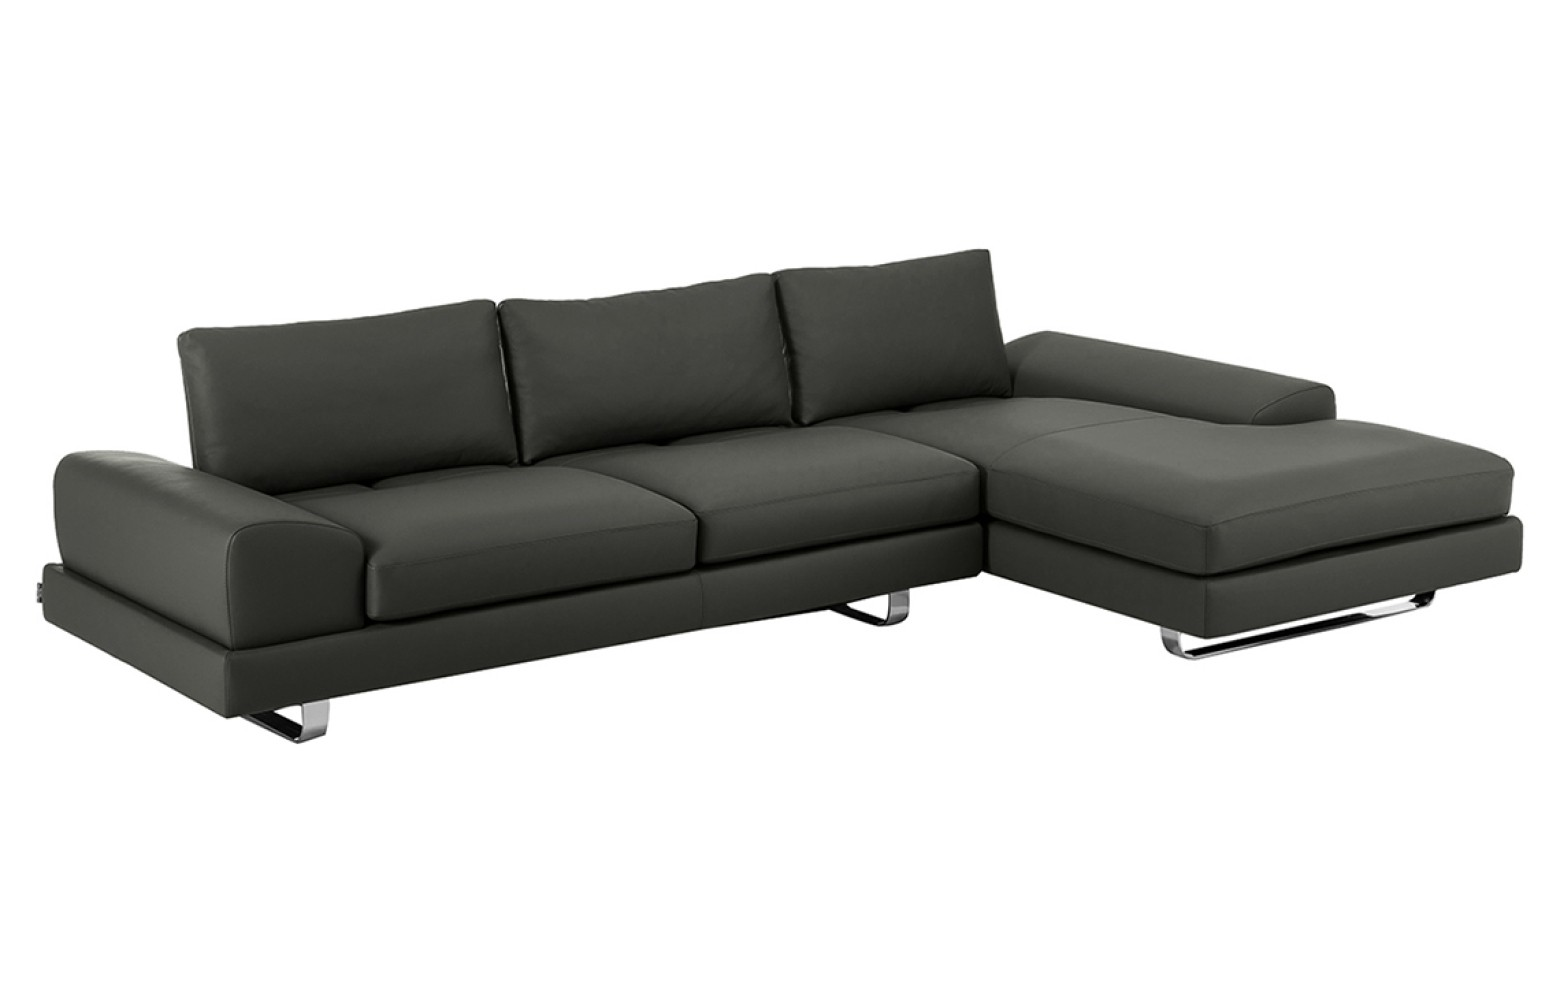 bloom ecksofa sofas online outlet who 39 s perfect. Black Bedroom Furniture Sets. Home Design Ideas